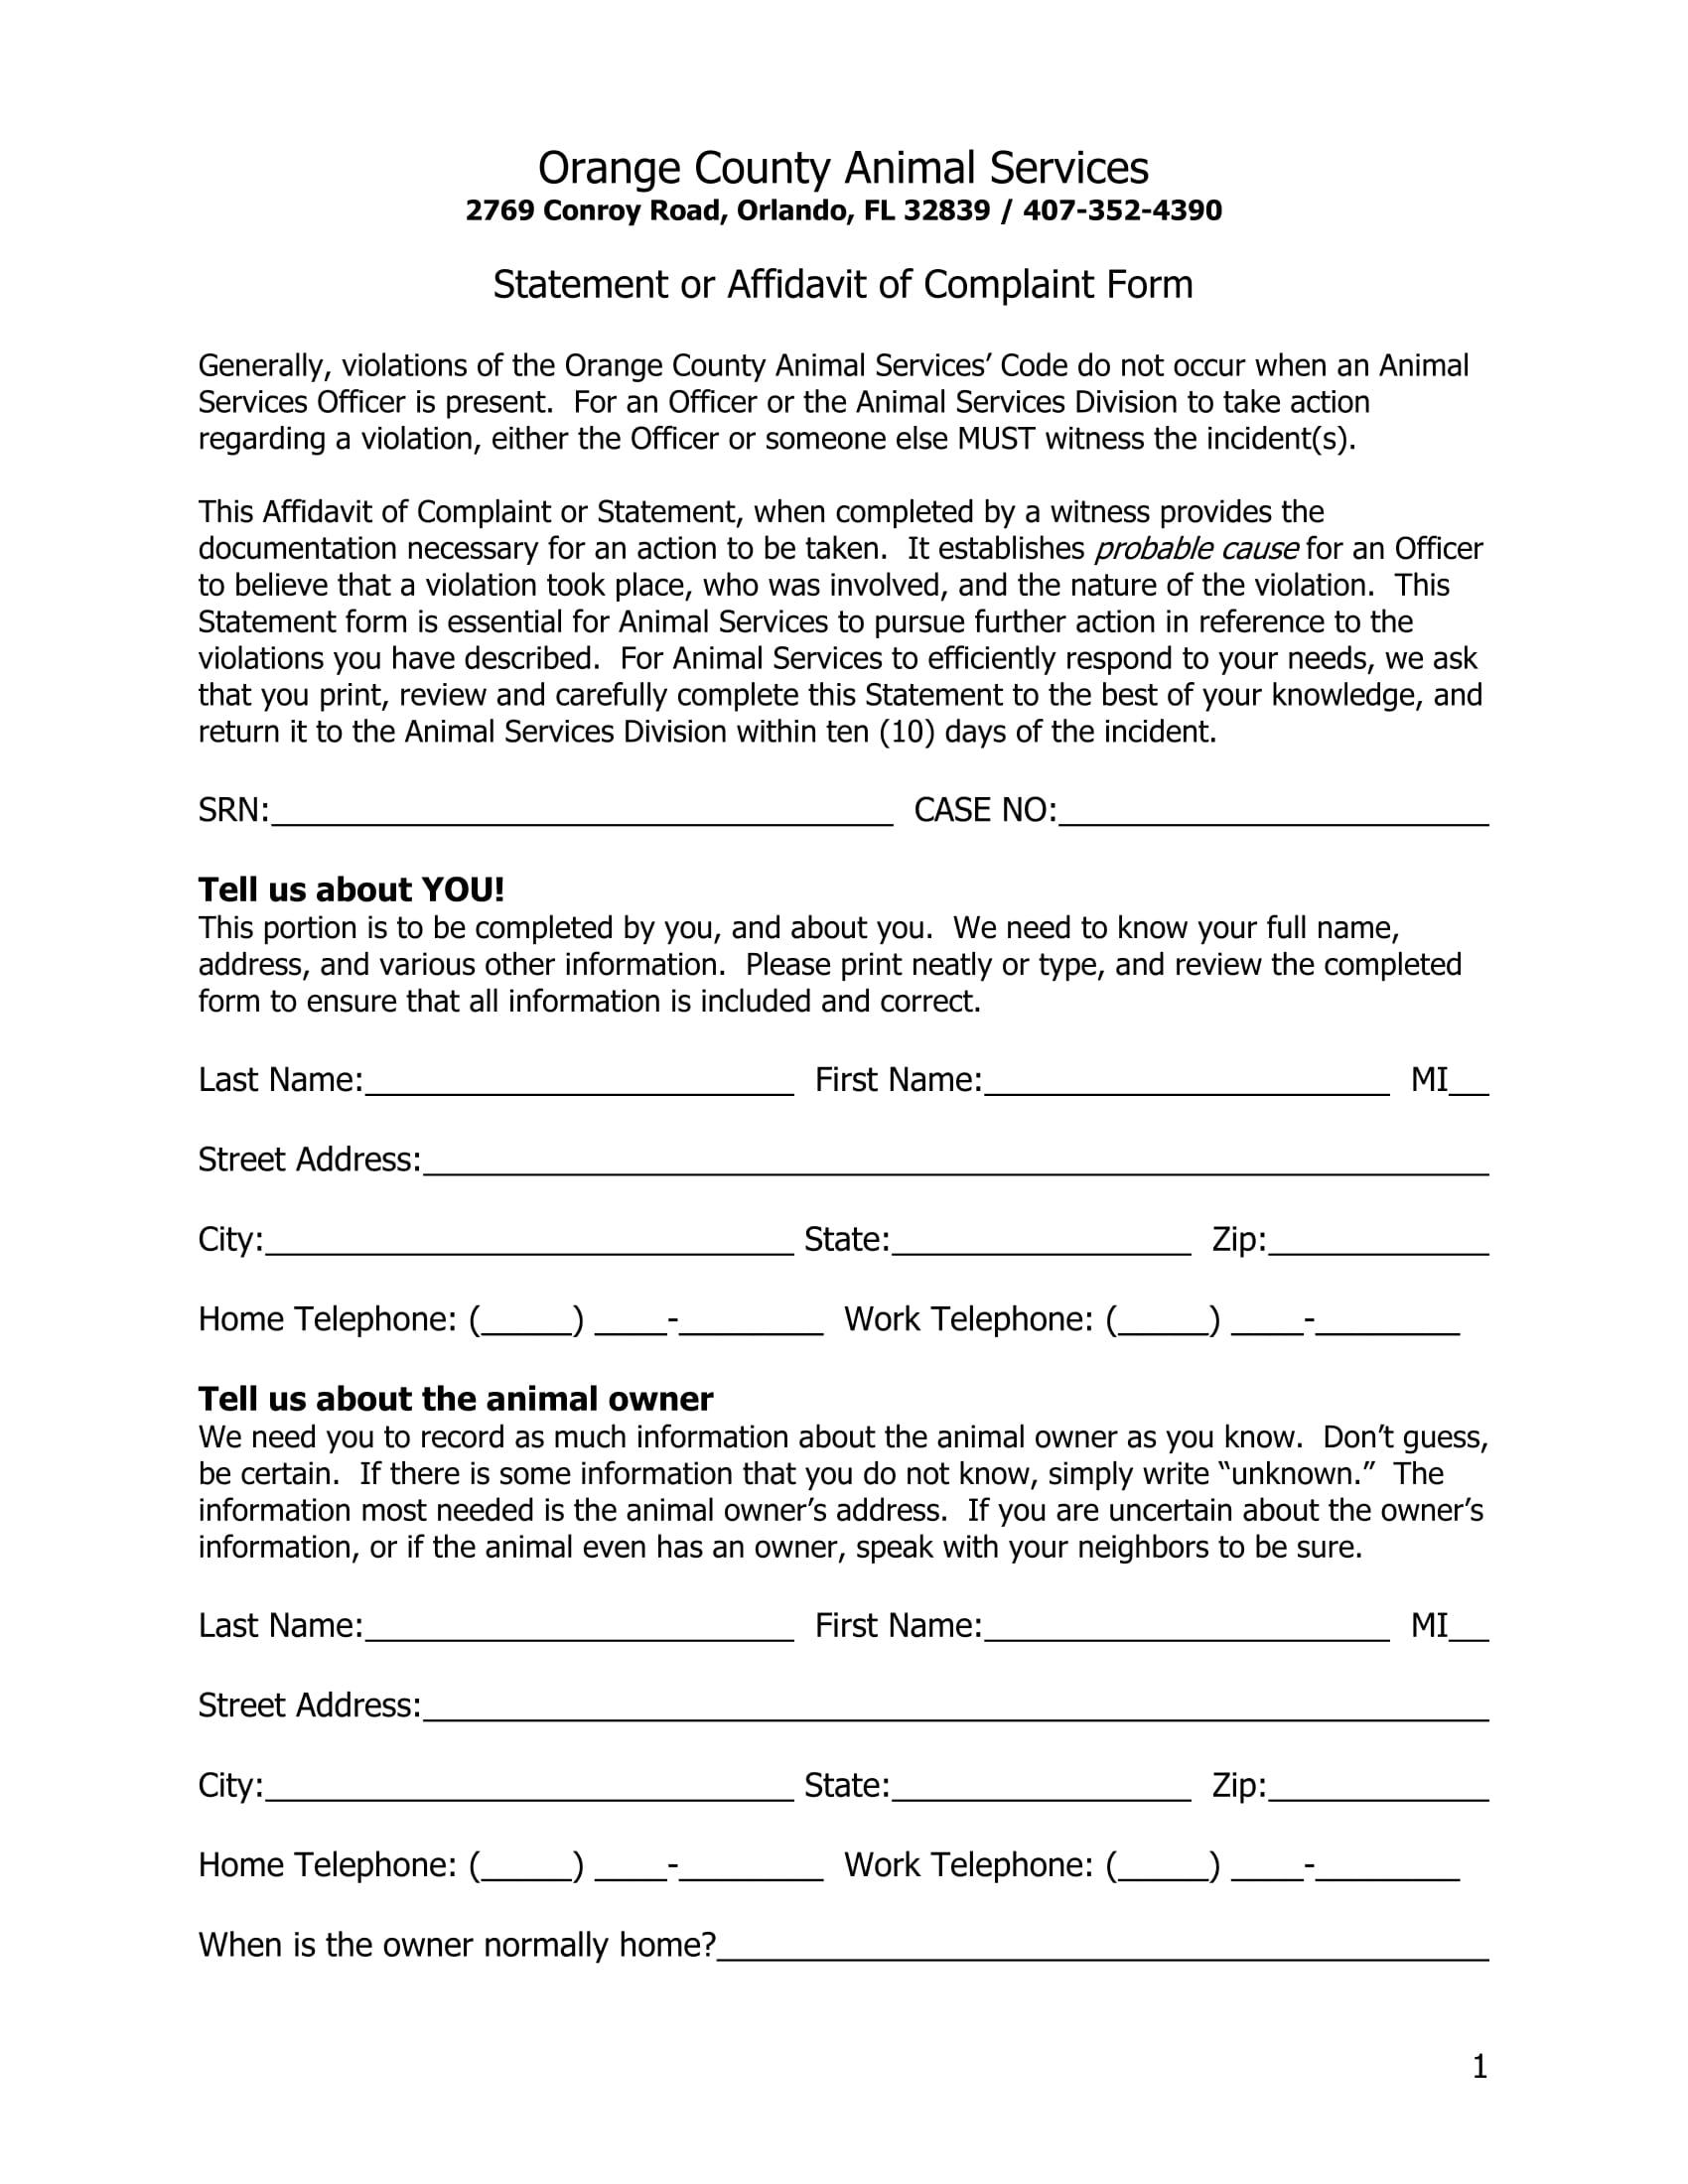 statement of affidavit of complaint form 1